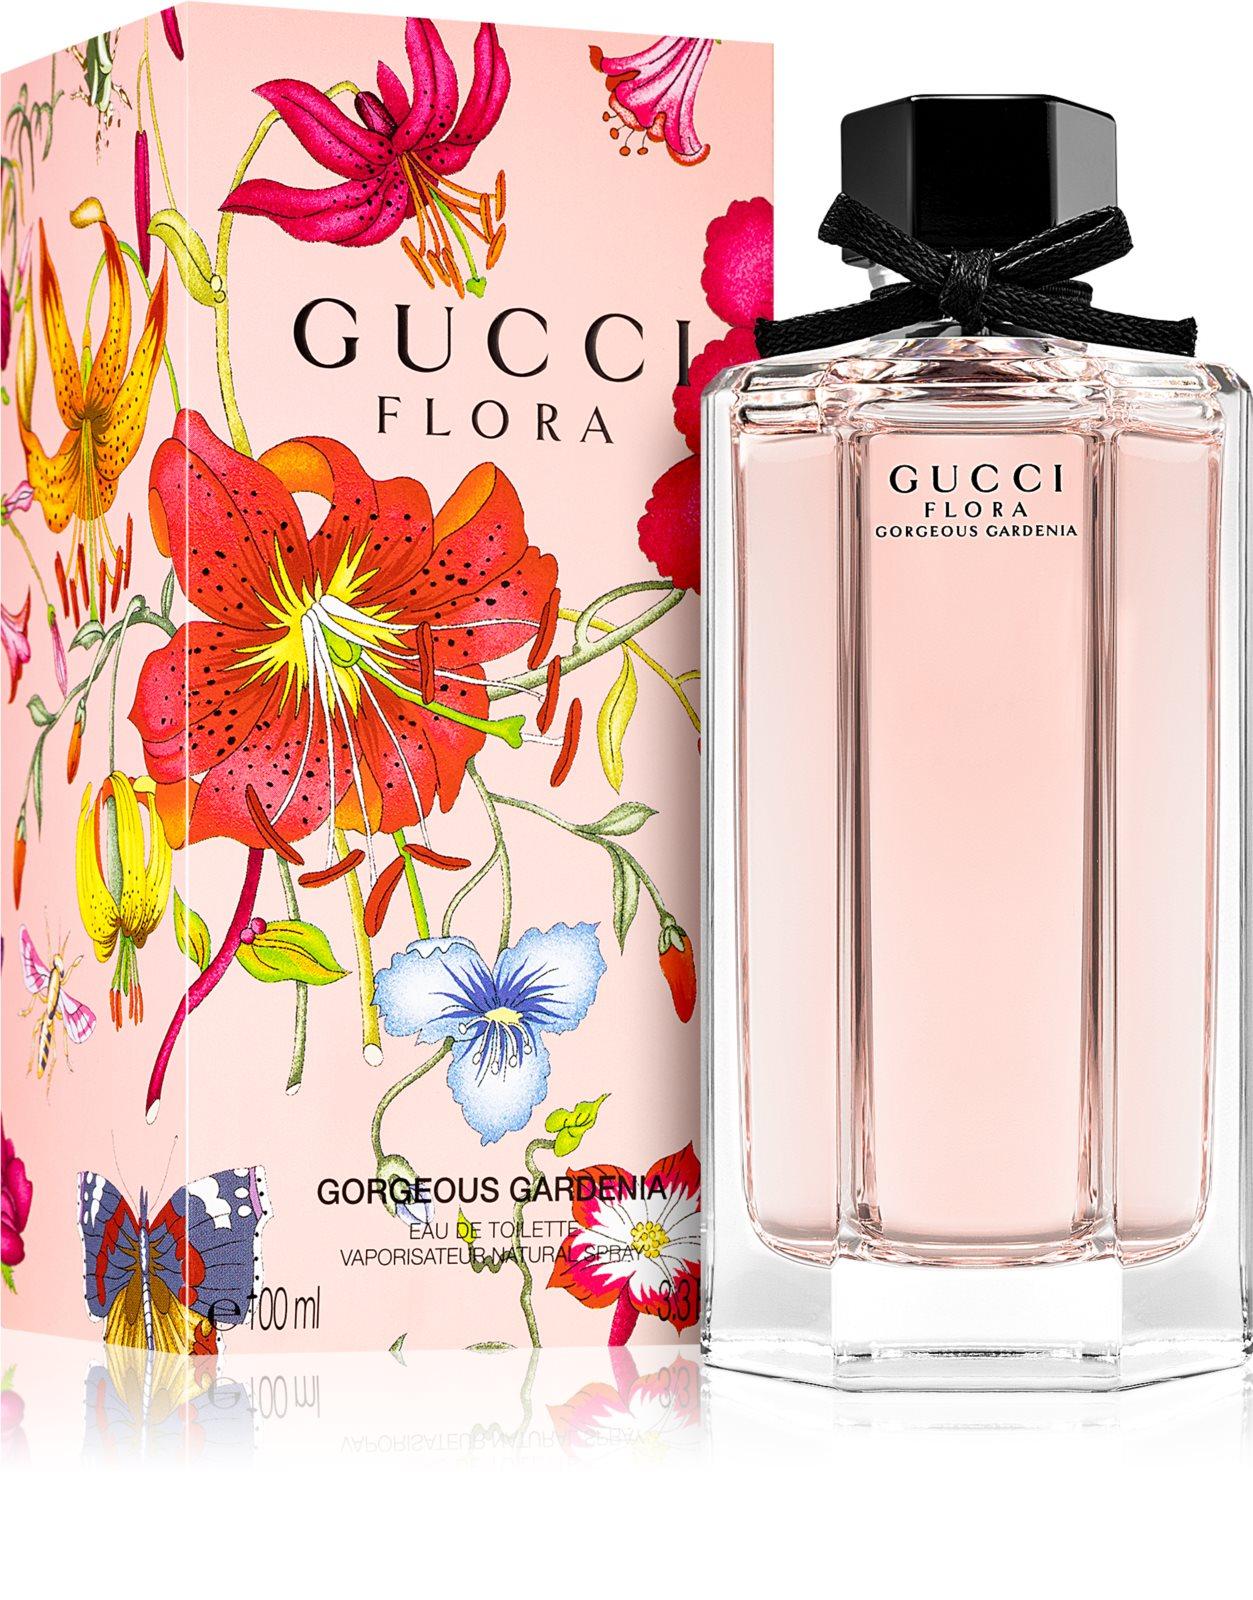 <center>Gucci Flora Gorgeous Gardenia</center>